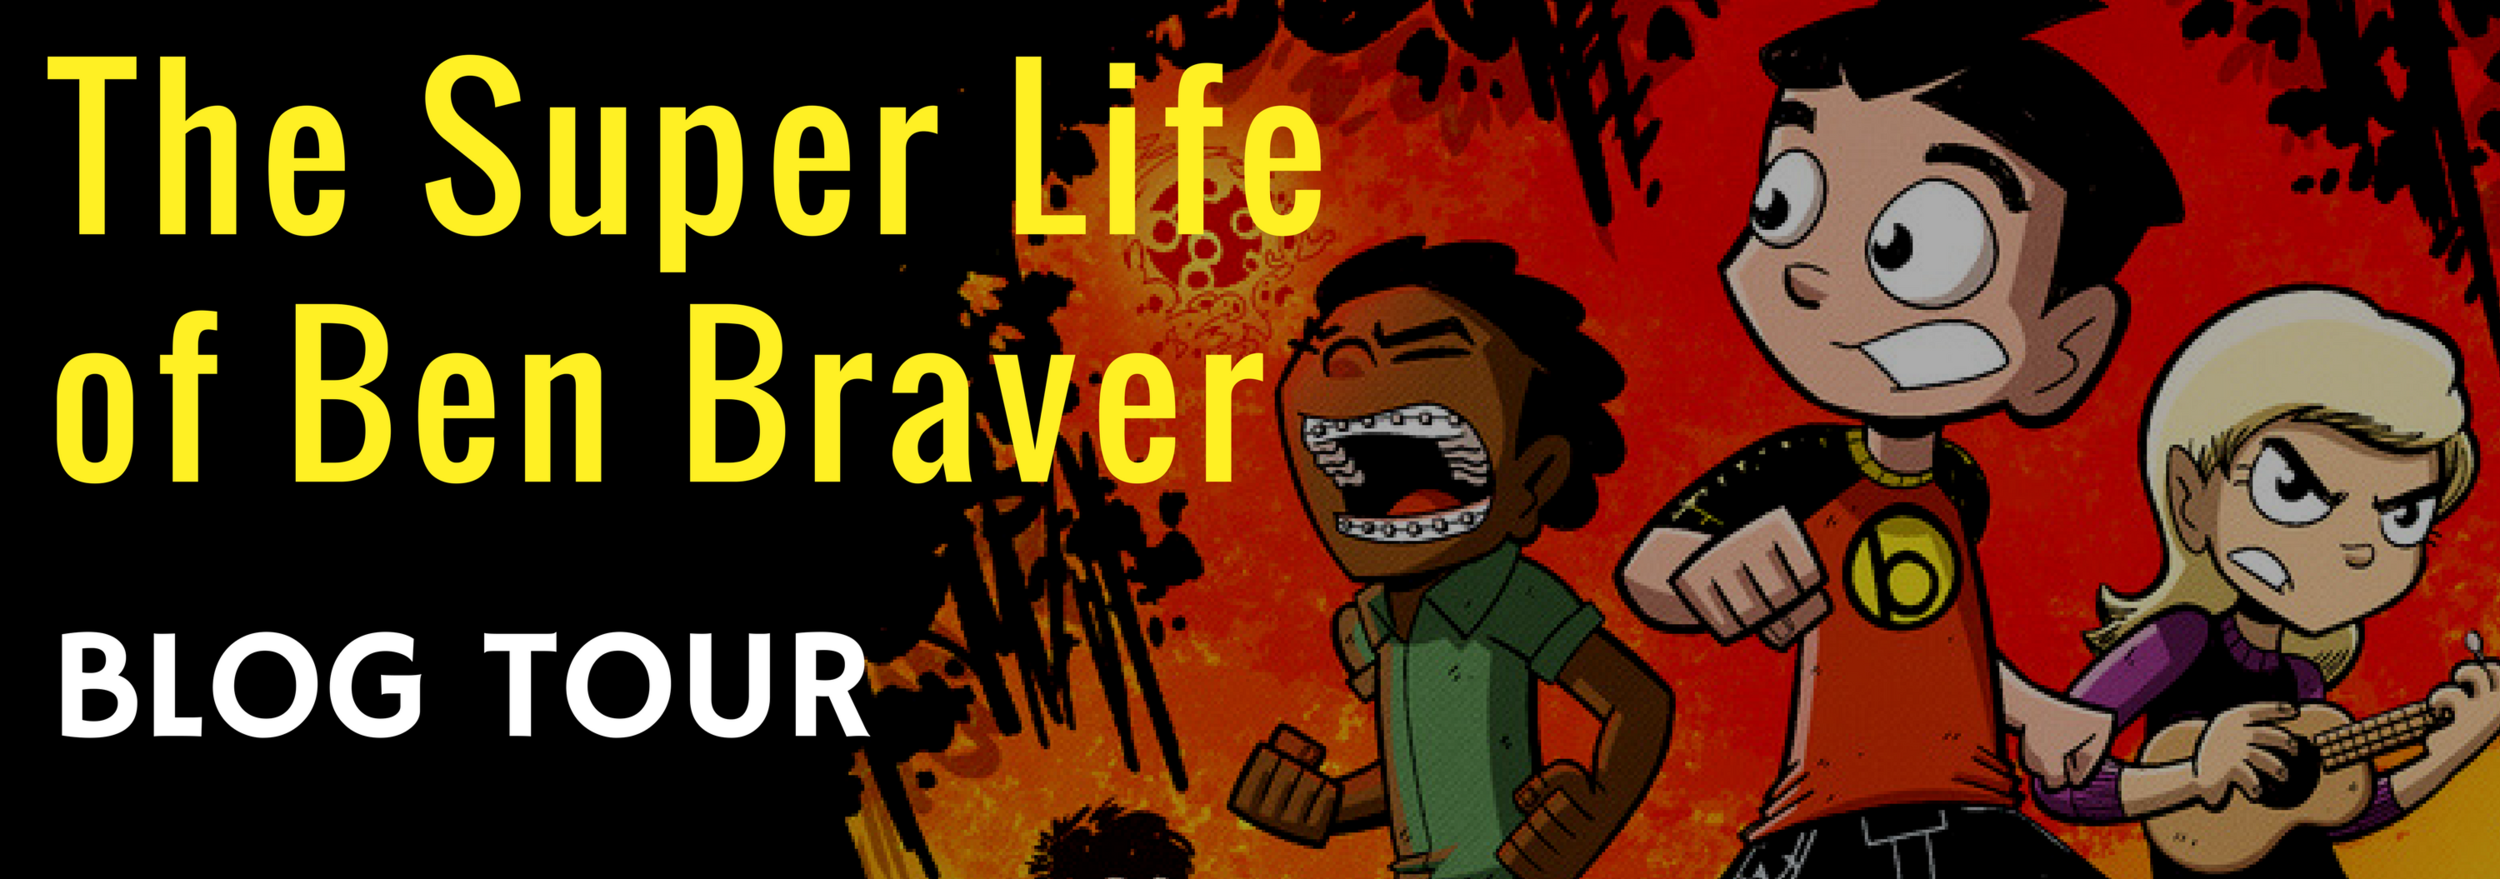 Ben Braver Blog Tour